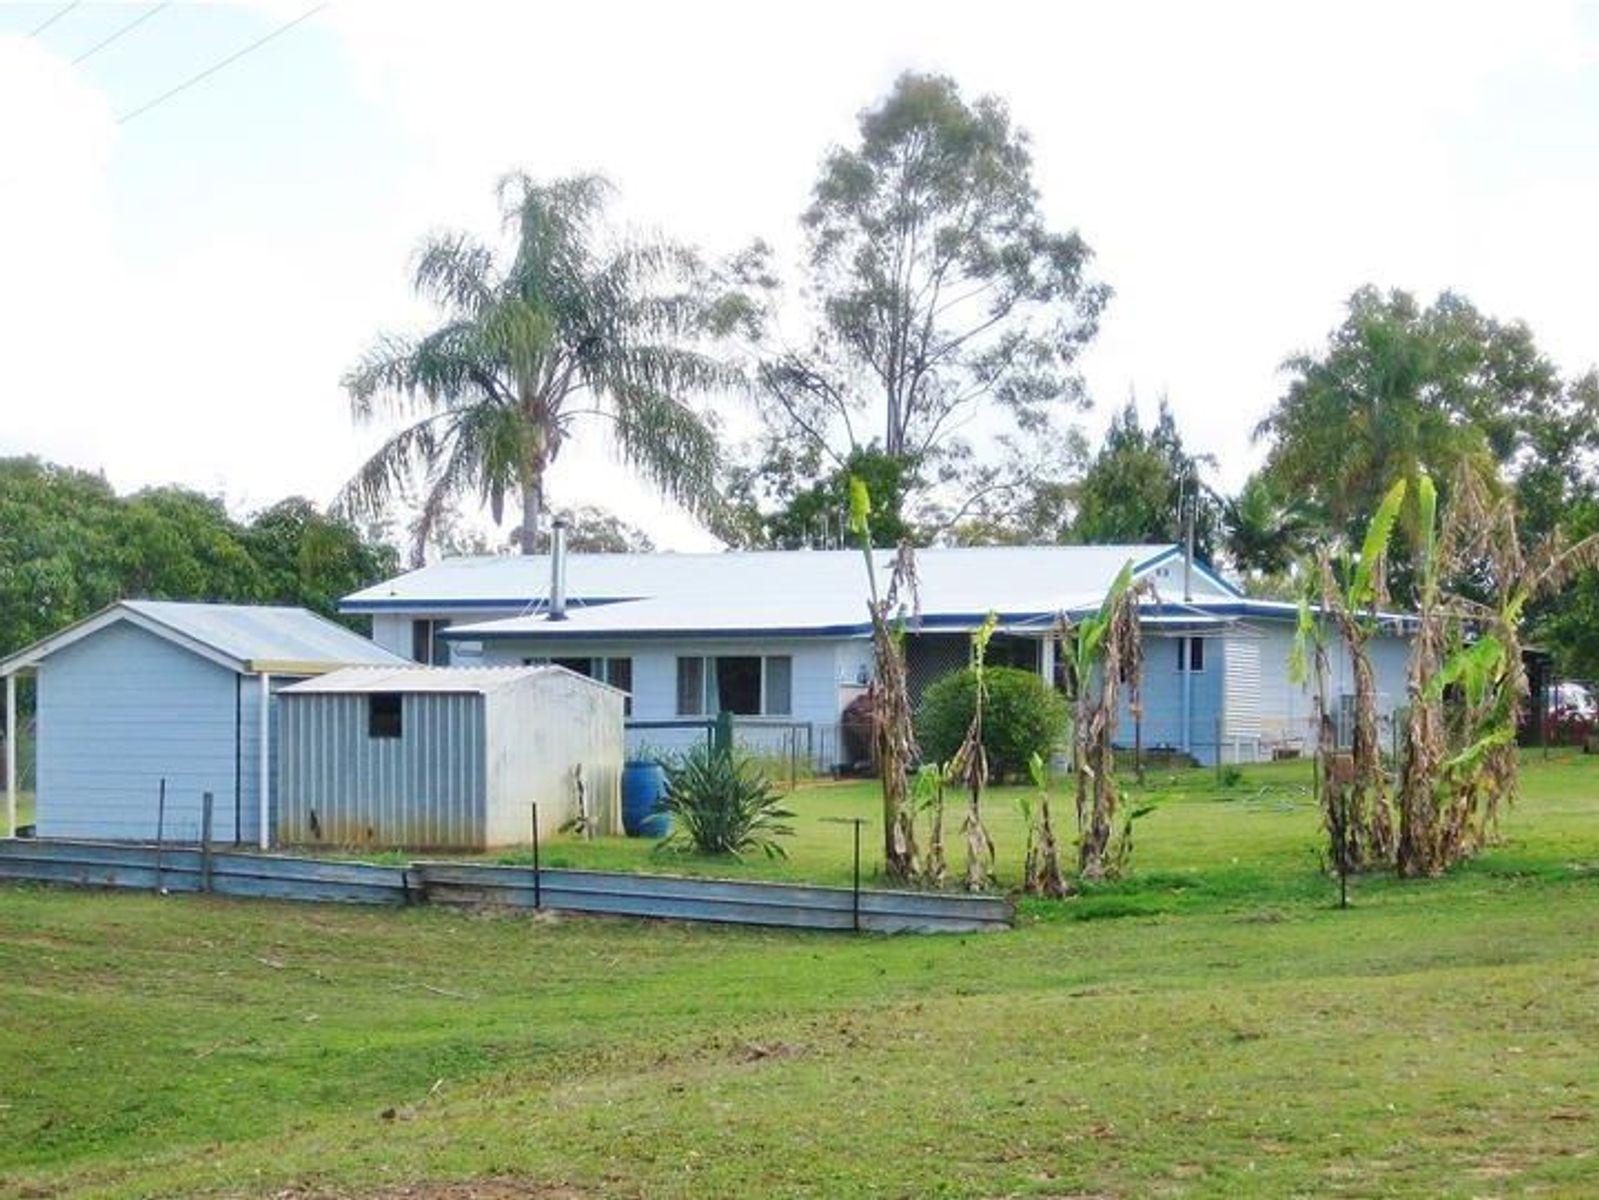 510 Promisedland Road, Promisedland, QLD 4660